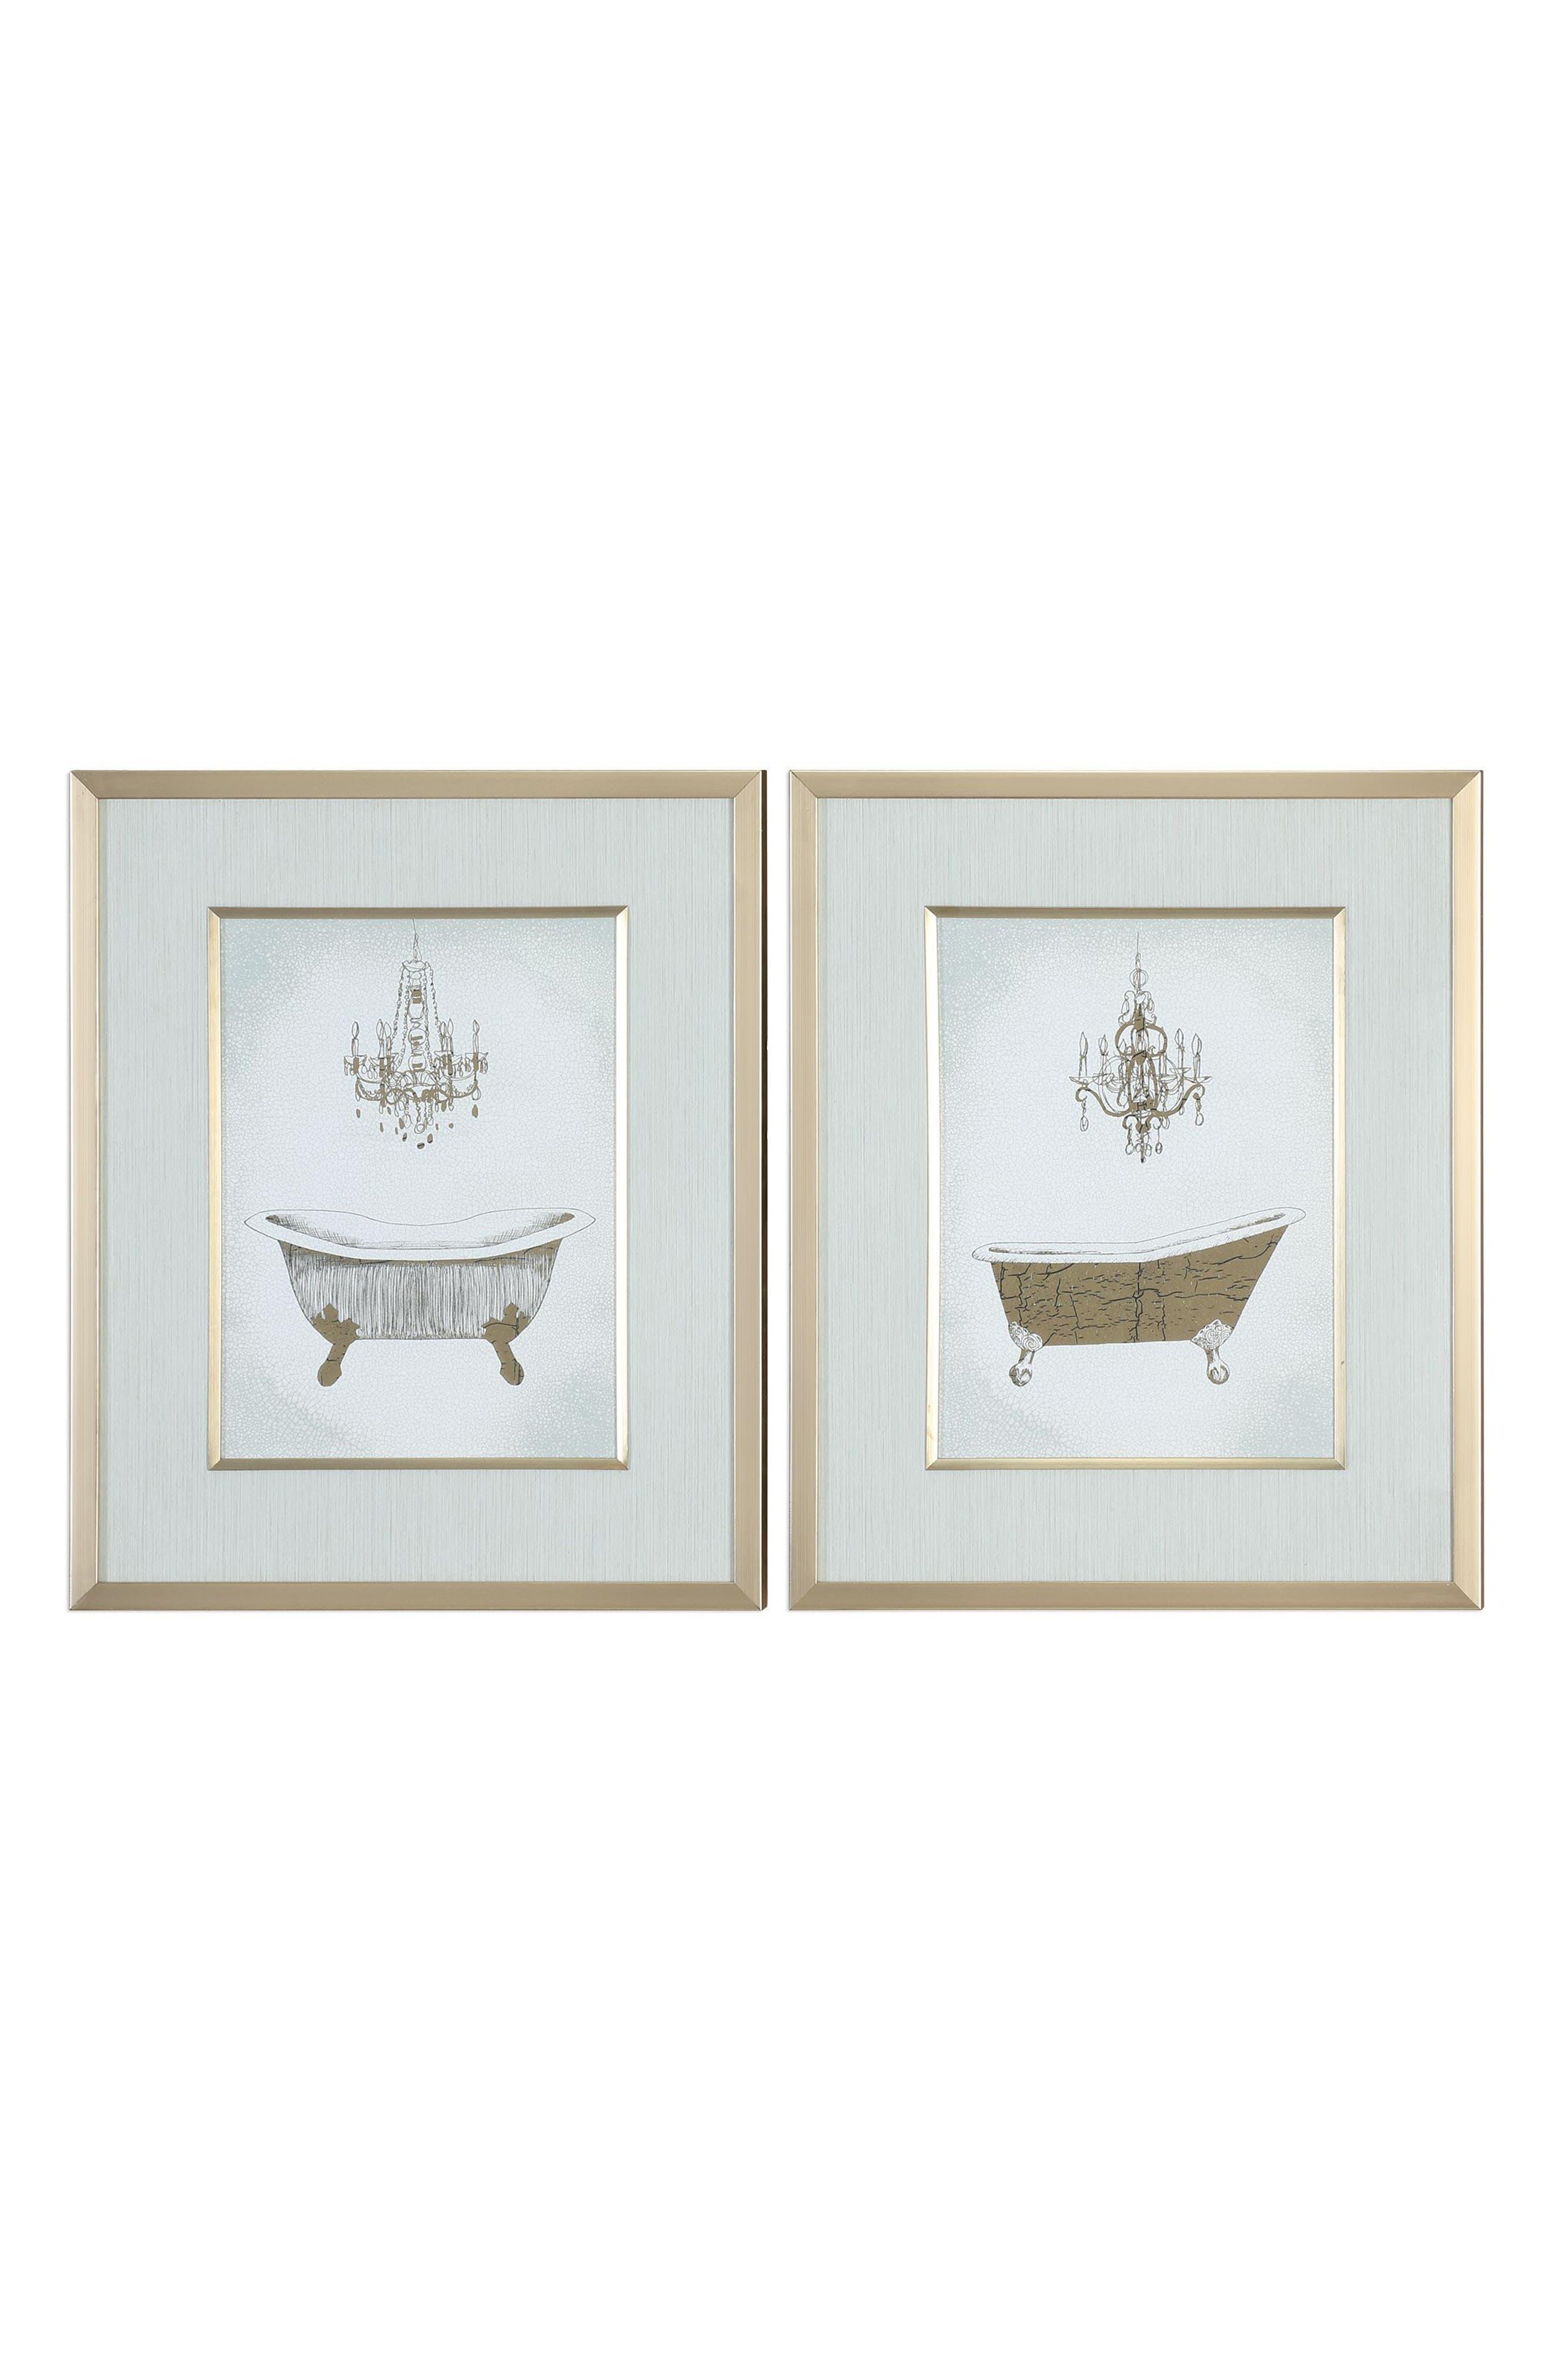 Main Image - Uttermost Gilded Bath Set of 2 Art Prints